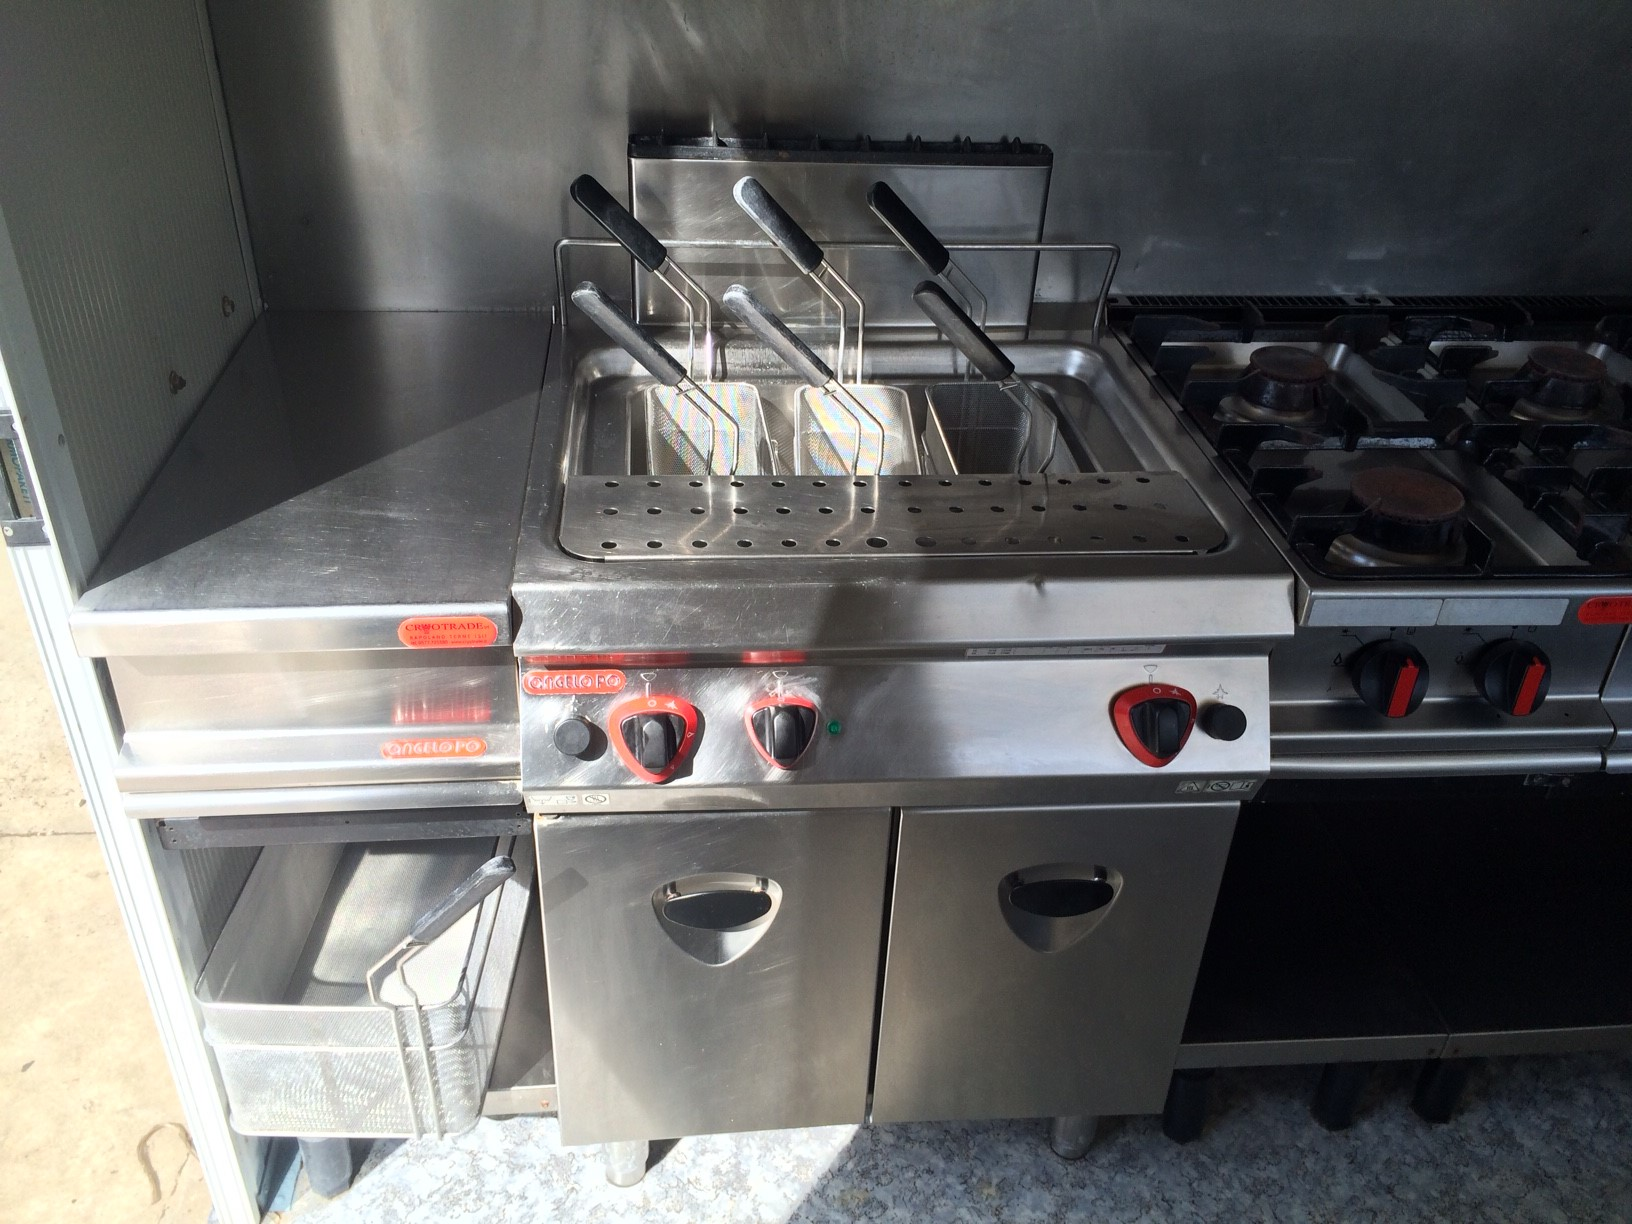 Noleggio Cucina Attrezzata - Cryo Trade